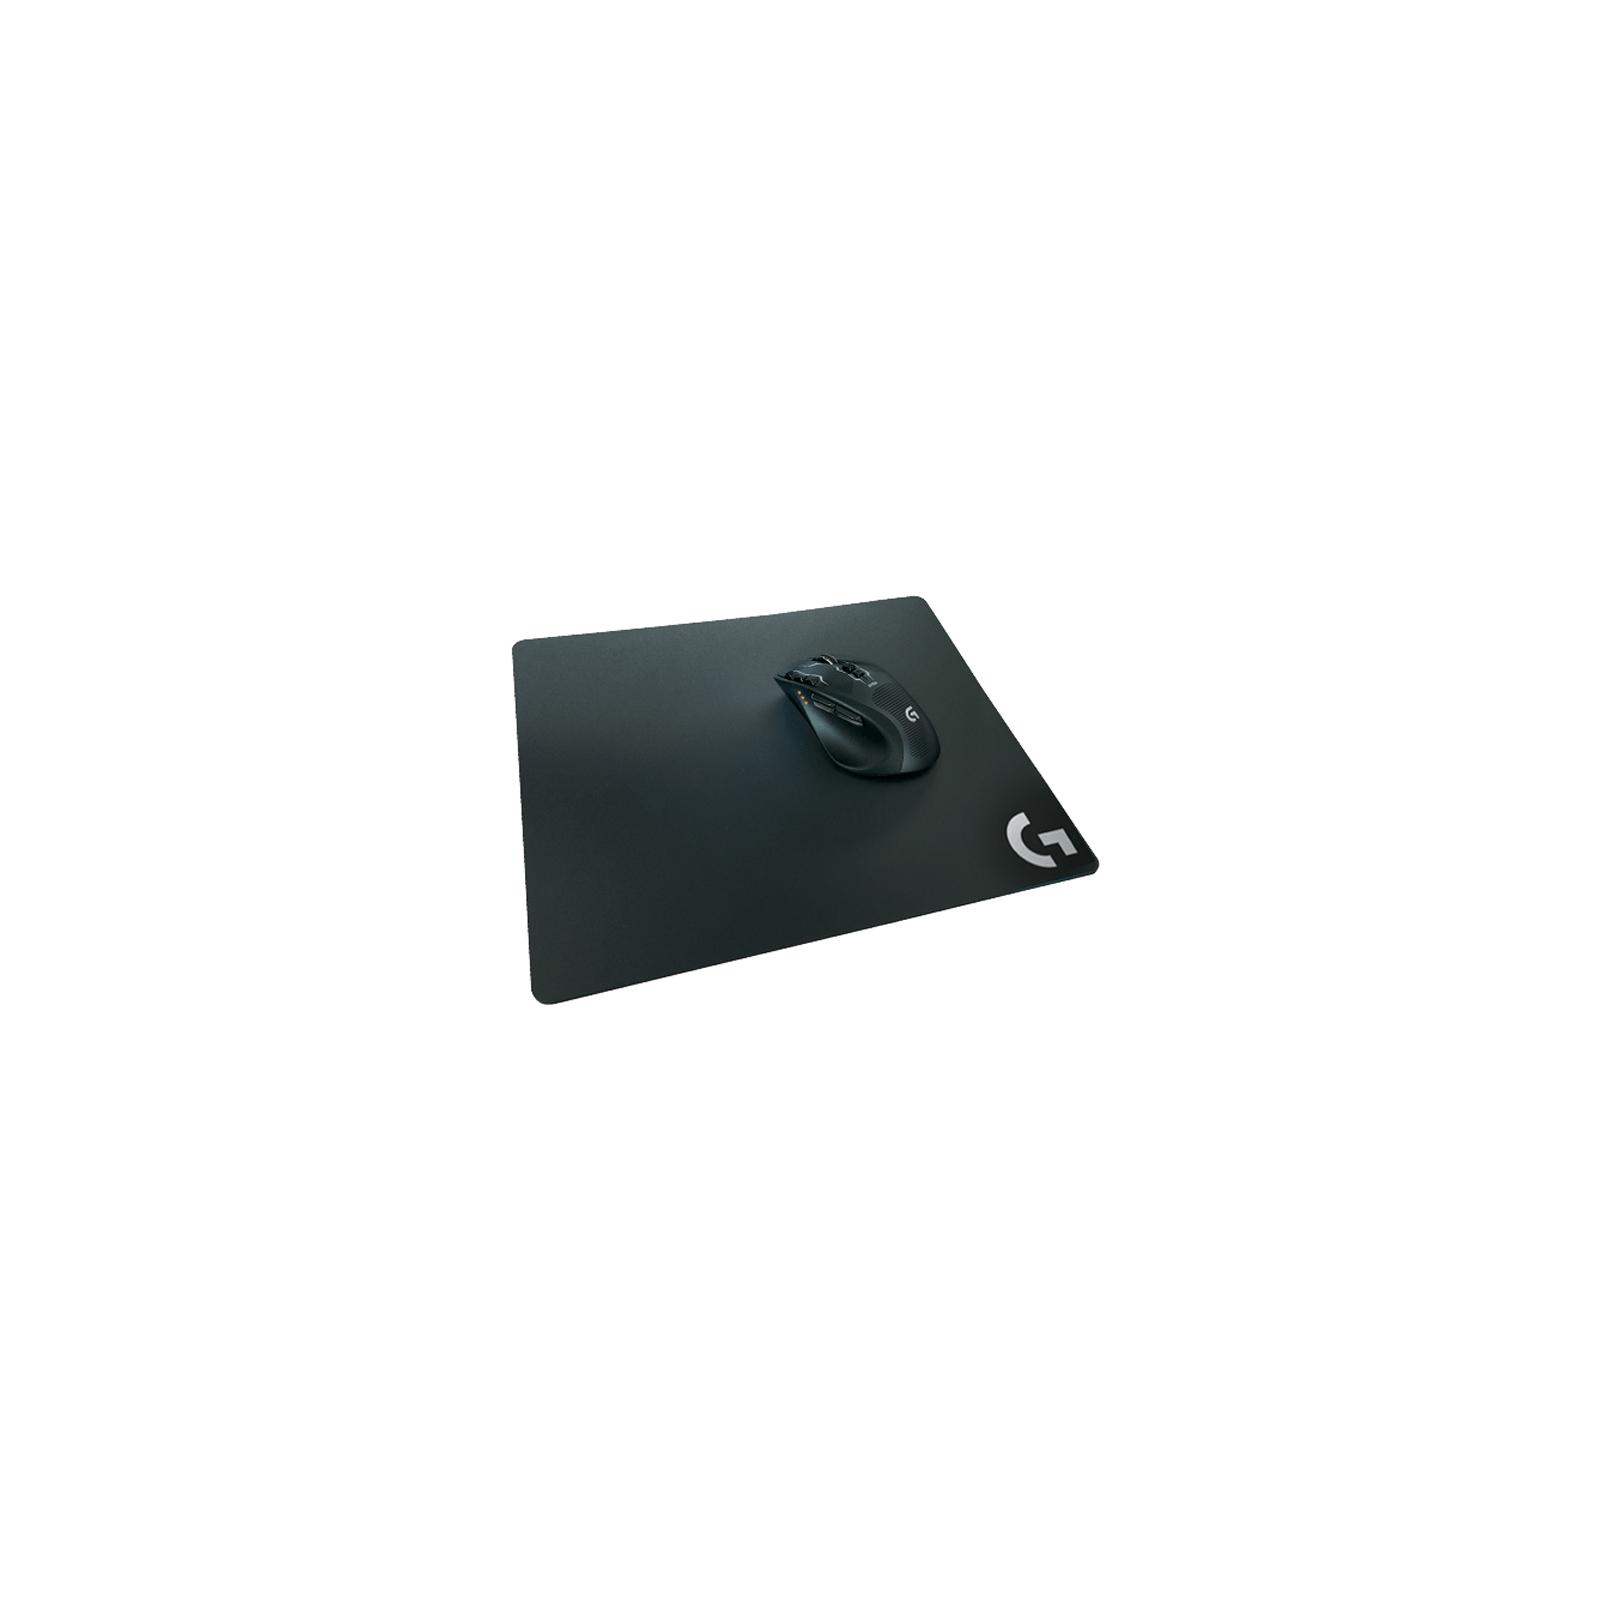 Коврик Logitech G440 Hard Gaming Mouse Pad (943-000099) изображение 3